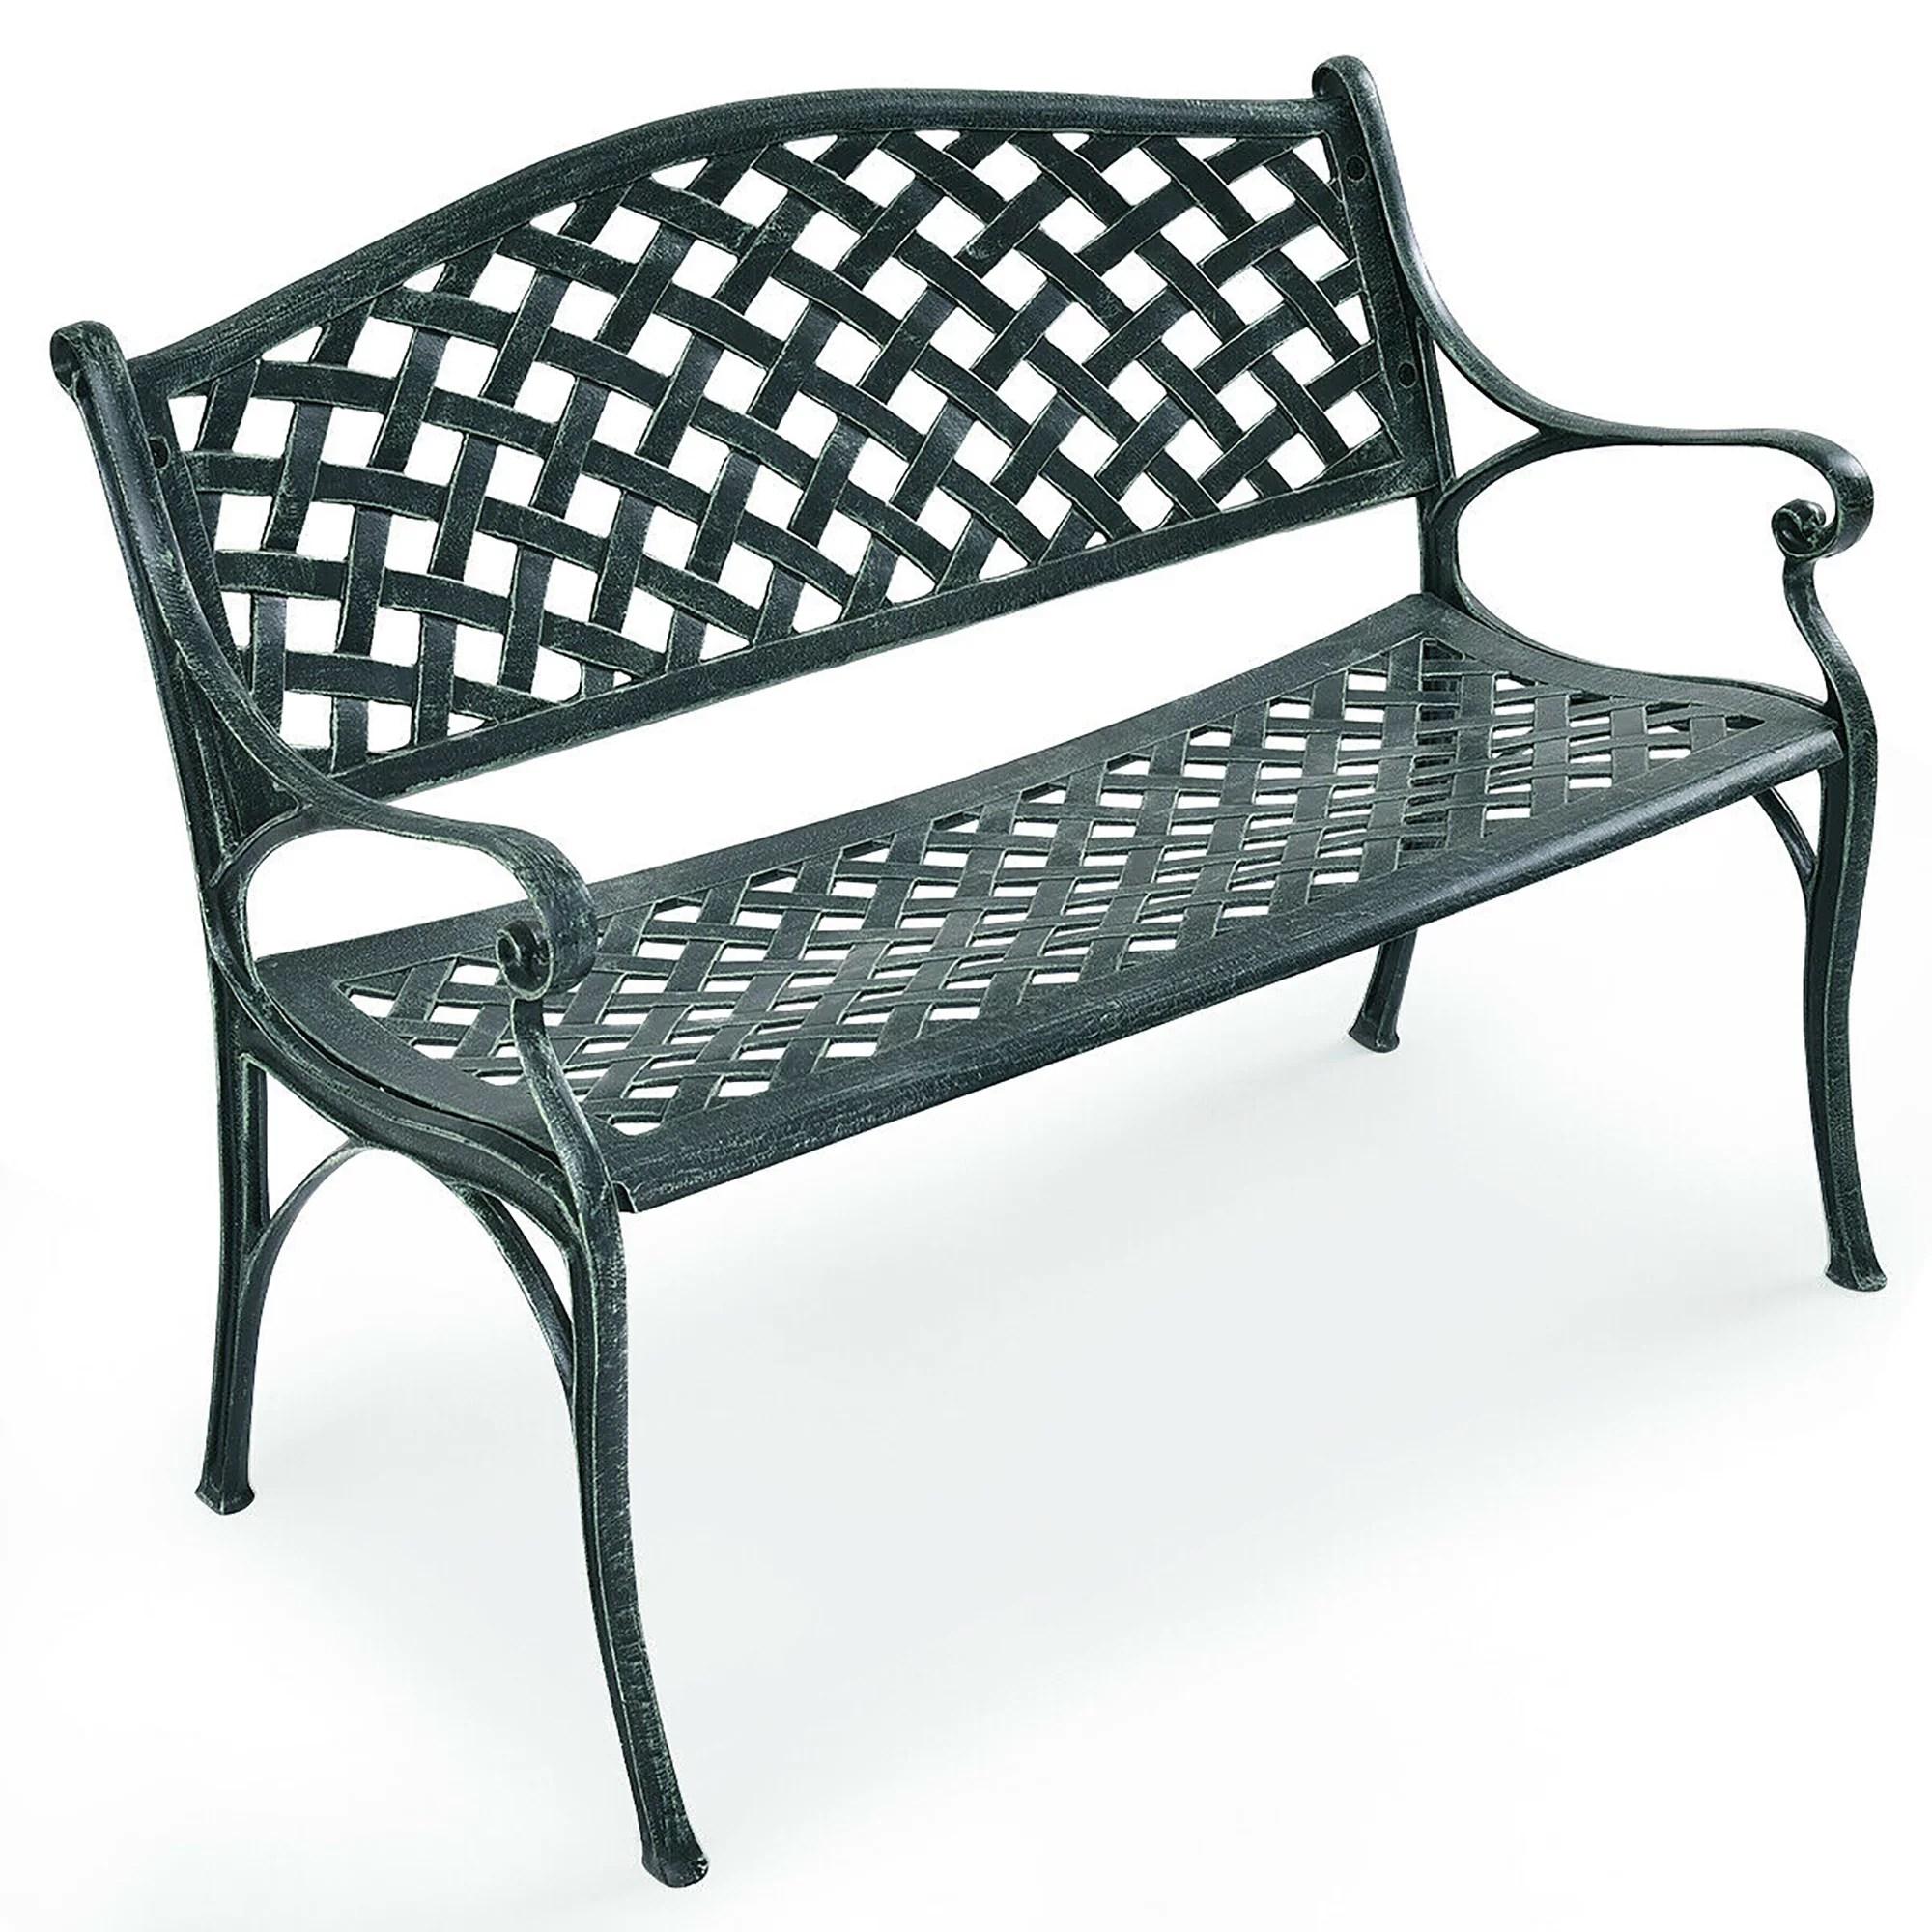 costway 40 outdoor antique garden bench aluminum frame seats chair patio garden furni walmart com